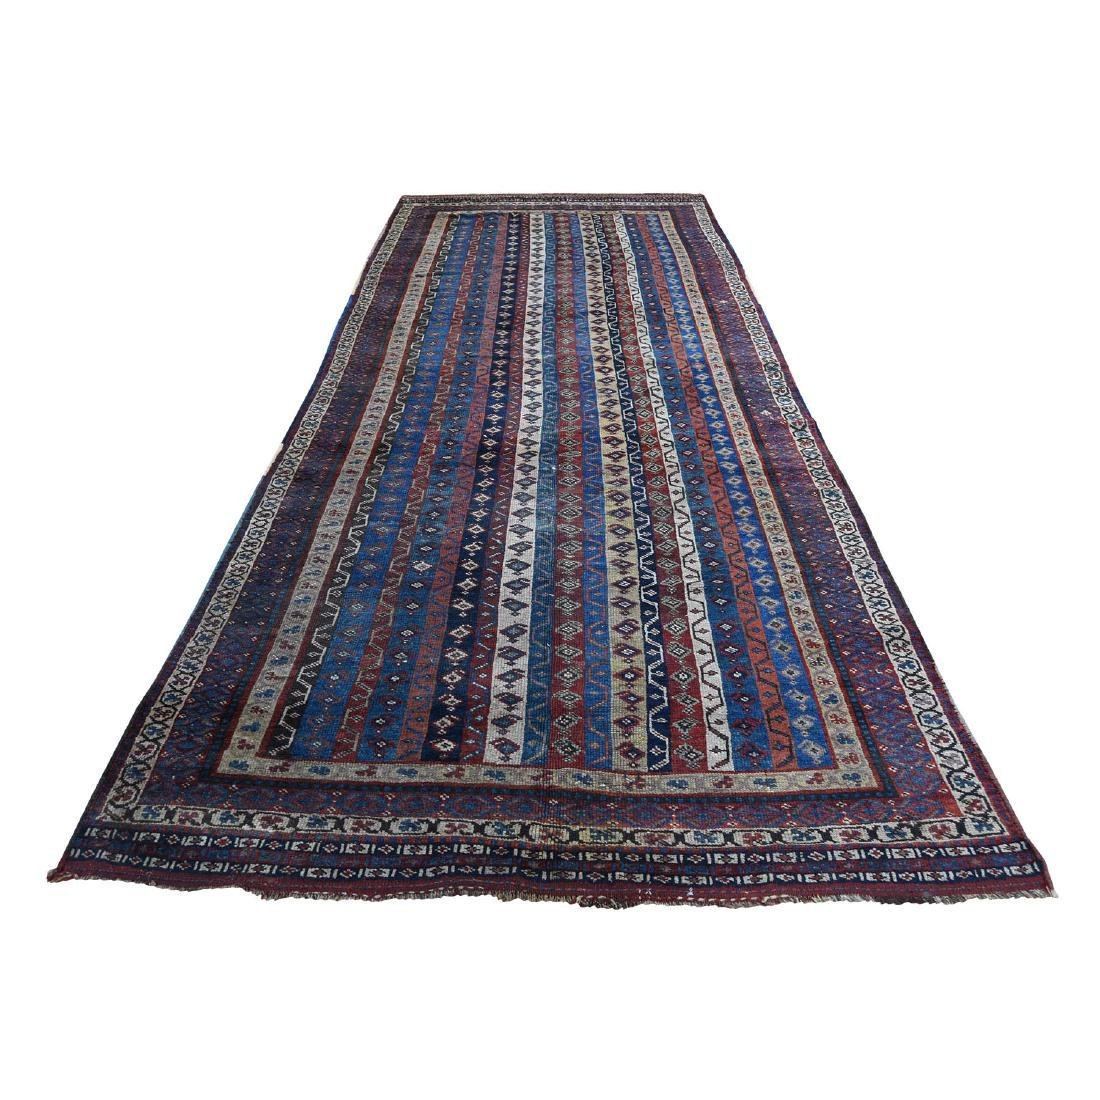 Antique Persian Tribal Lori Buft With Shawl Design Wide